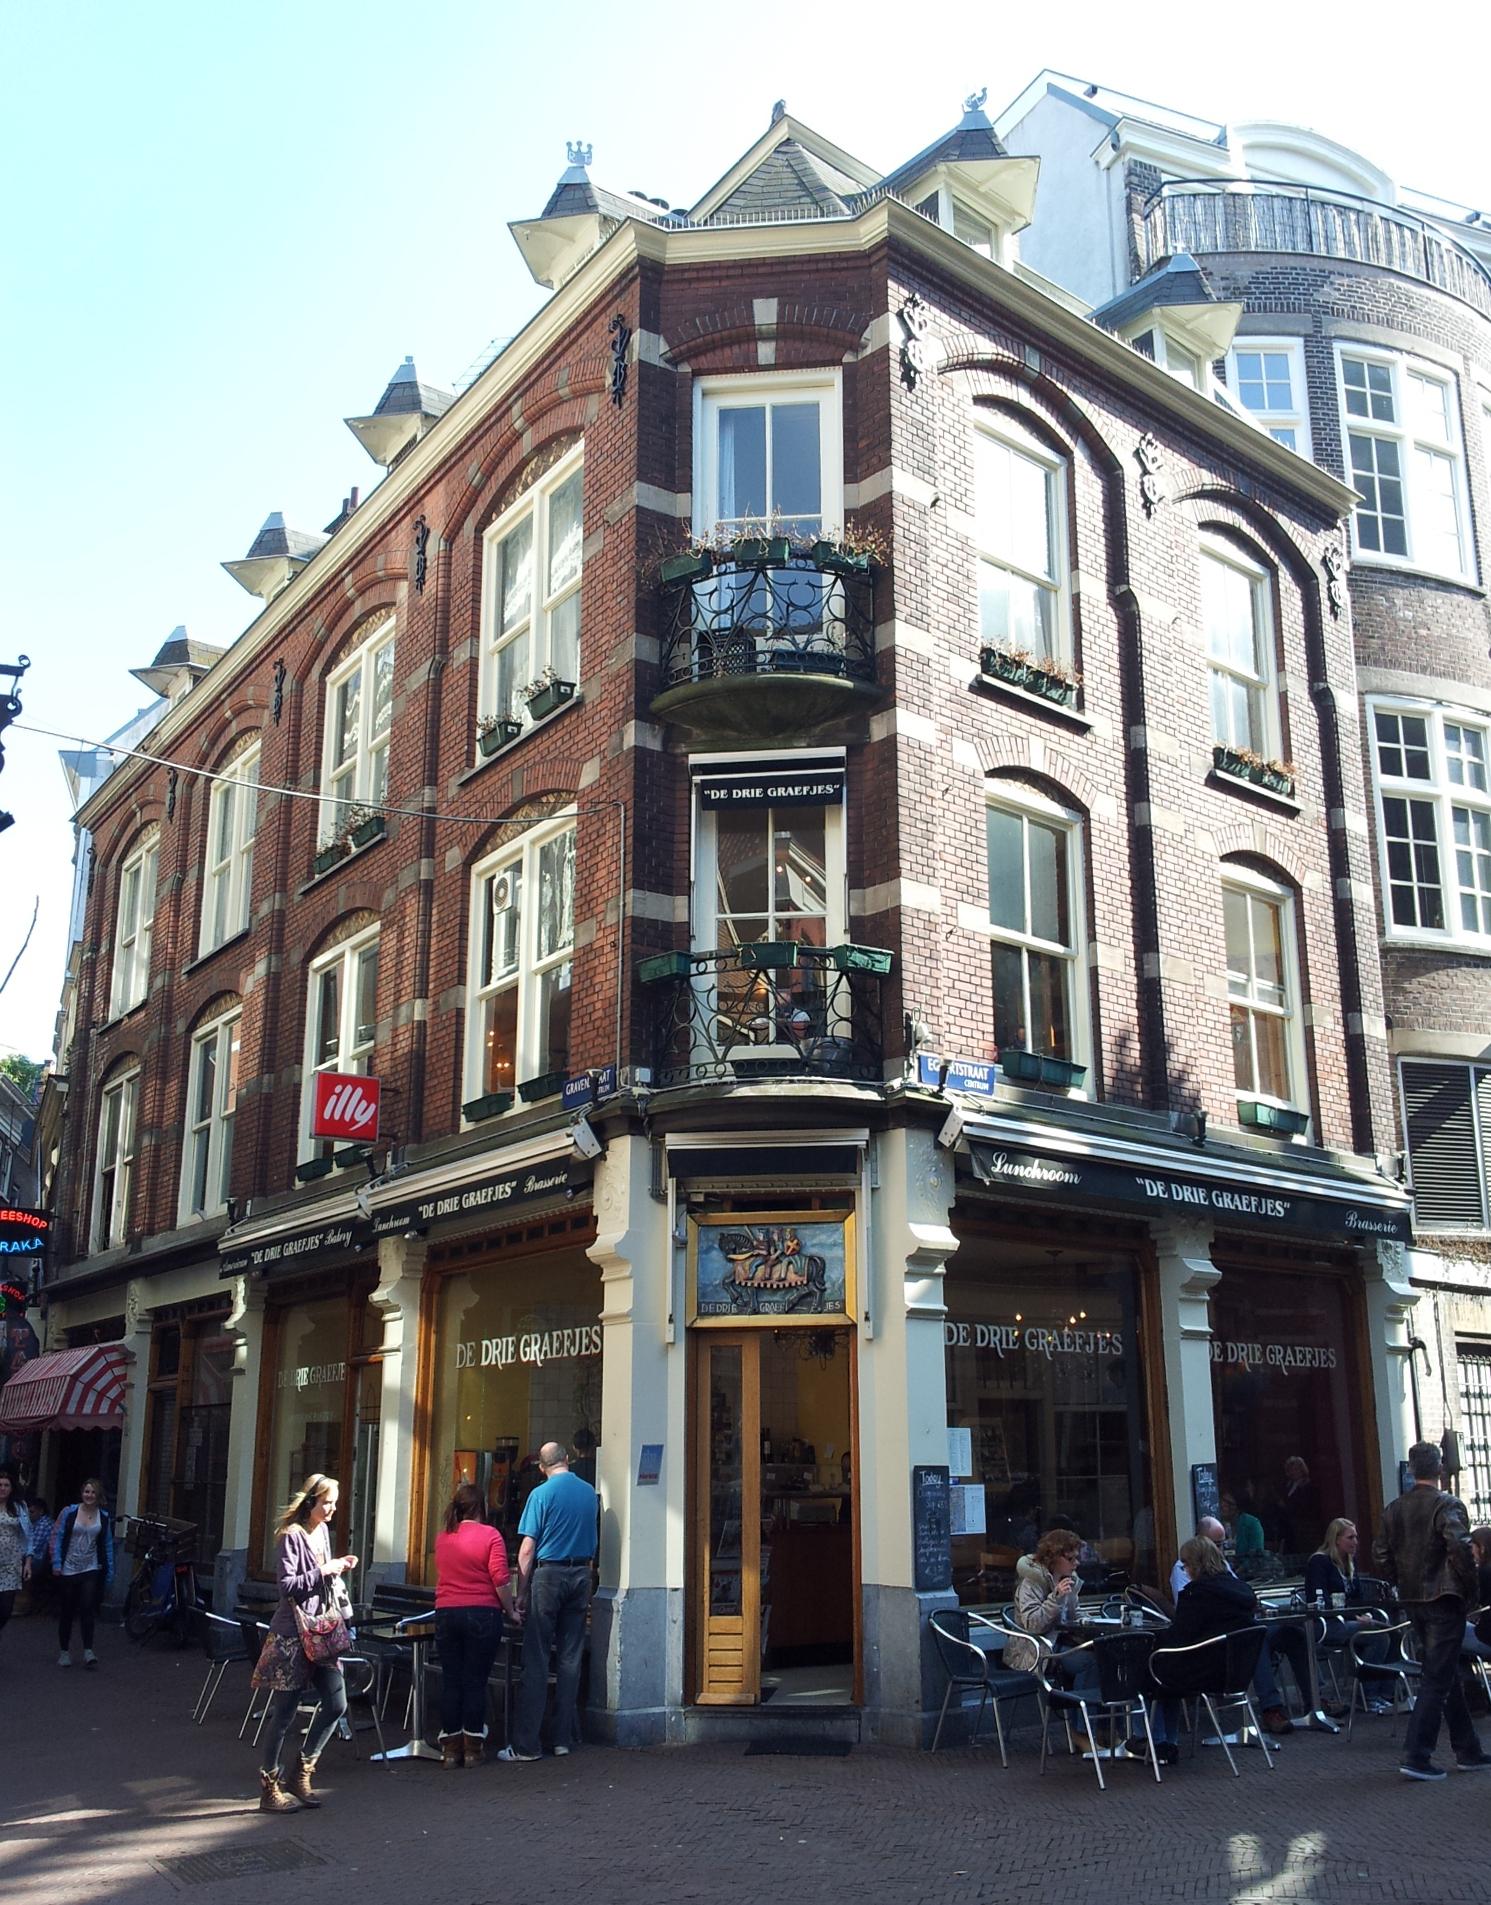 File:Gravenstraat 9-13, Amsterdam.jpg